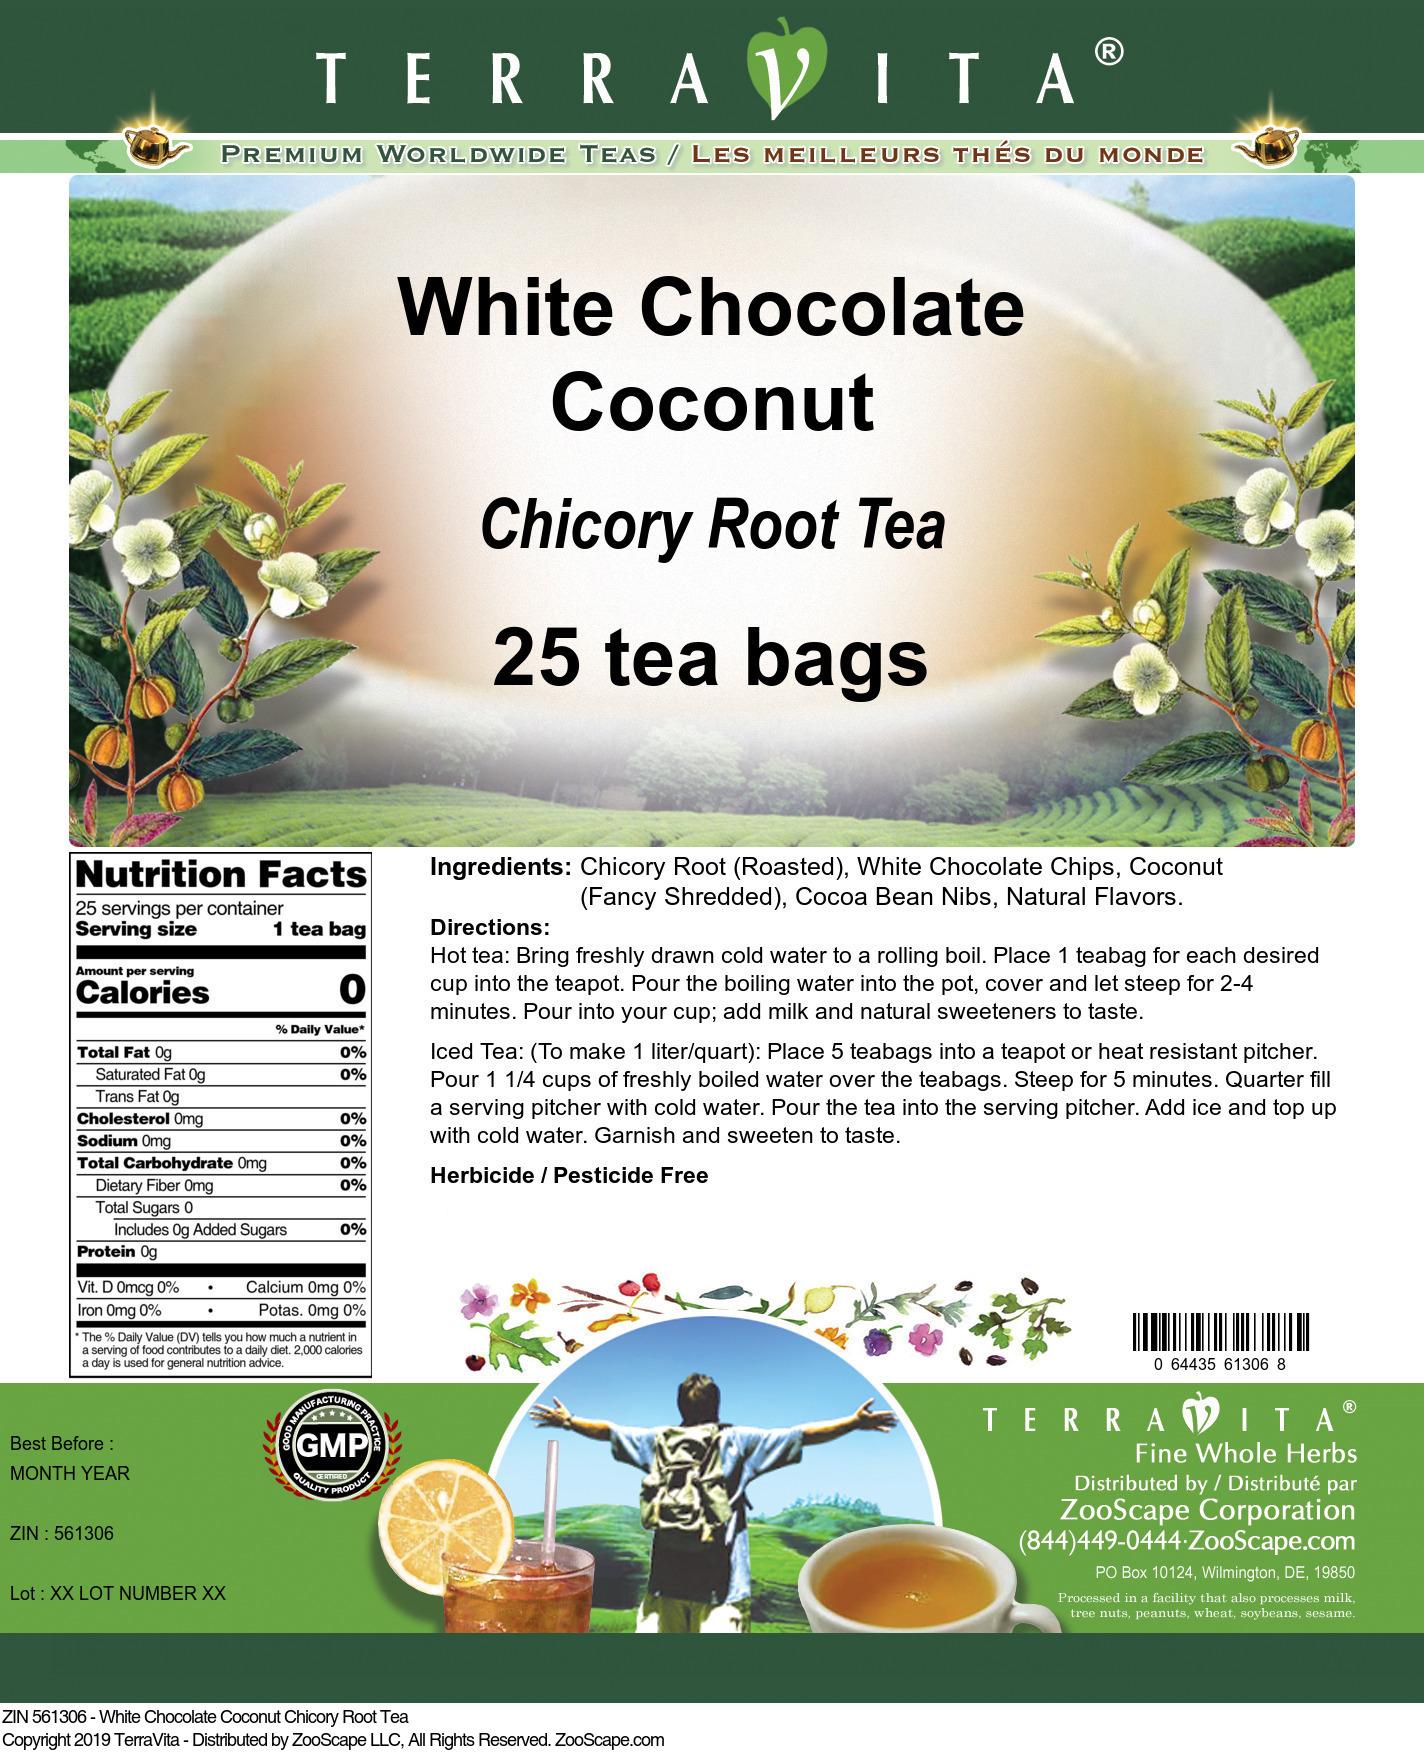 White Chocolate Coconut Chicory Root